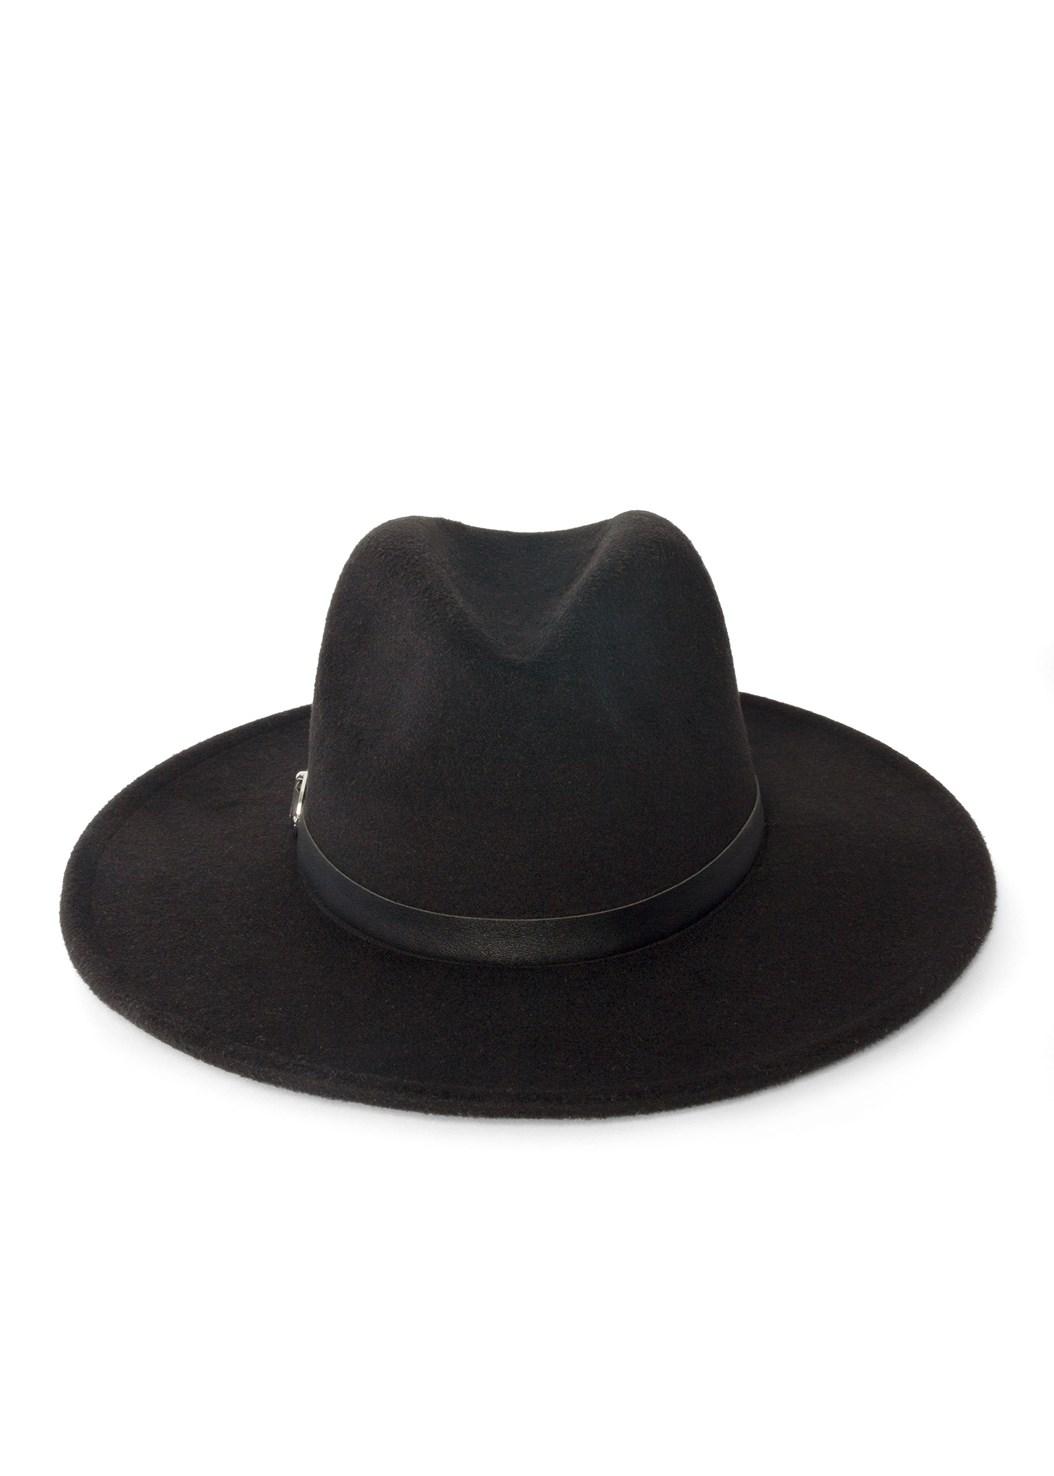 Wide Brim Buckle Hat,Paisely Printed Wrap Dress,Open Heel Booties,Studded Matte Hoops